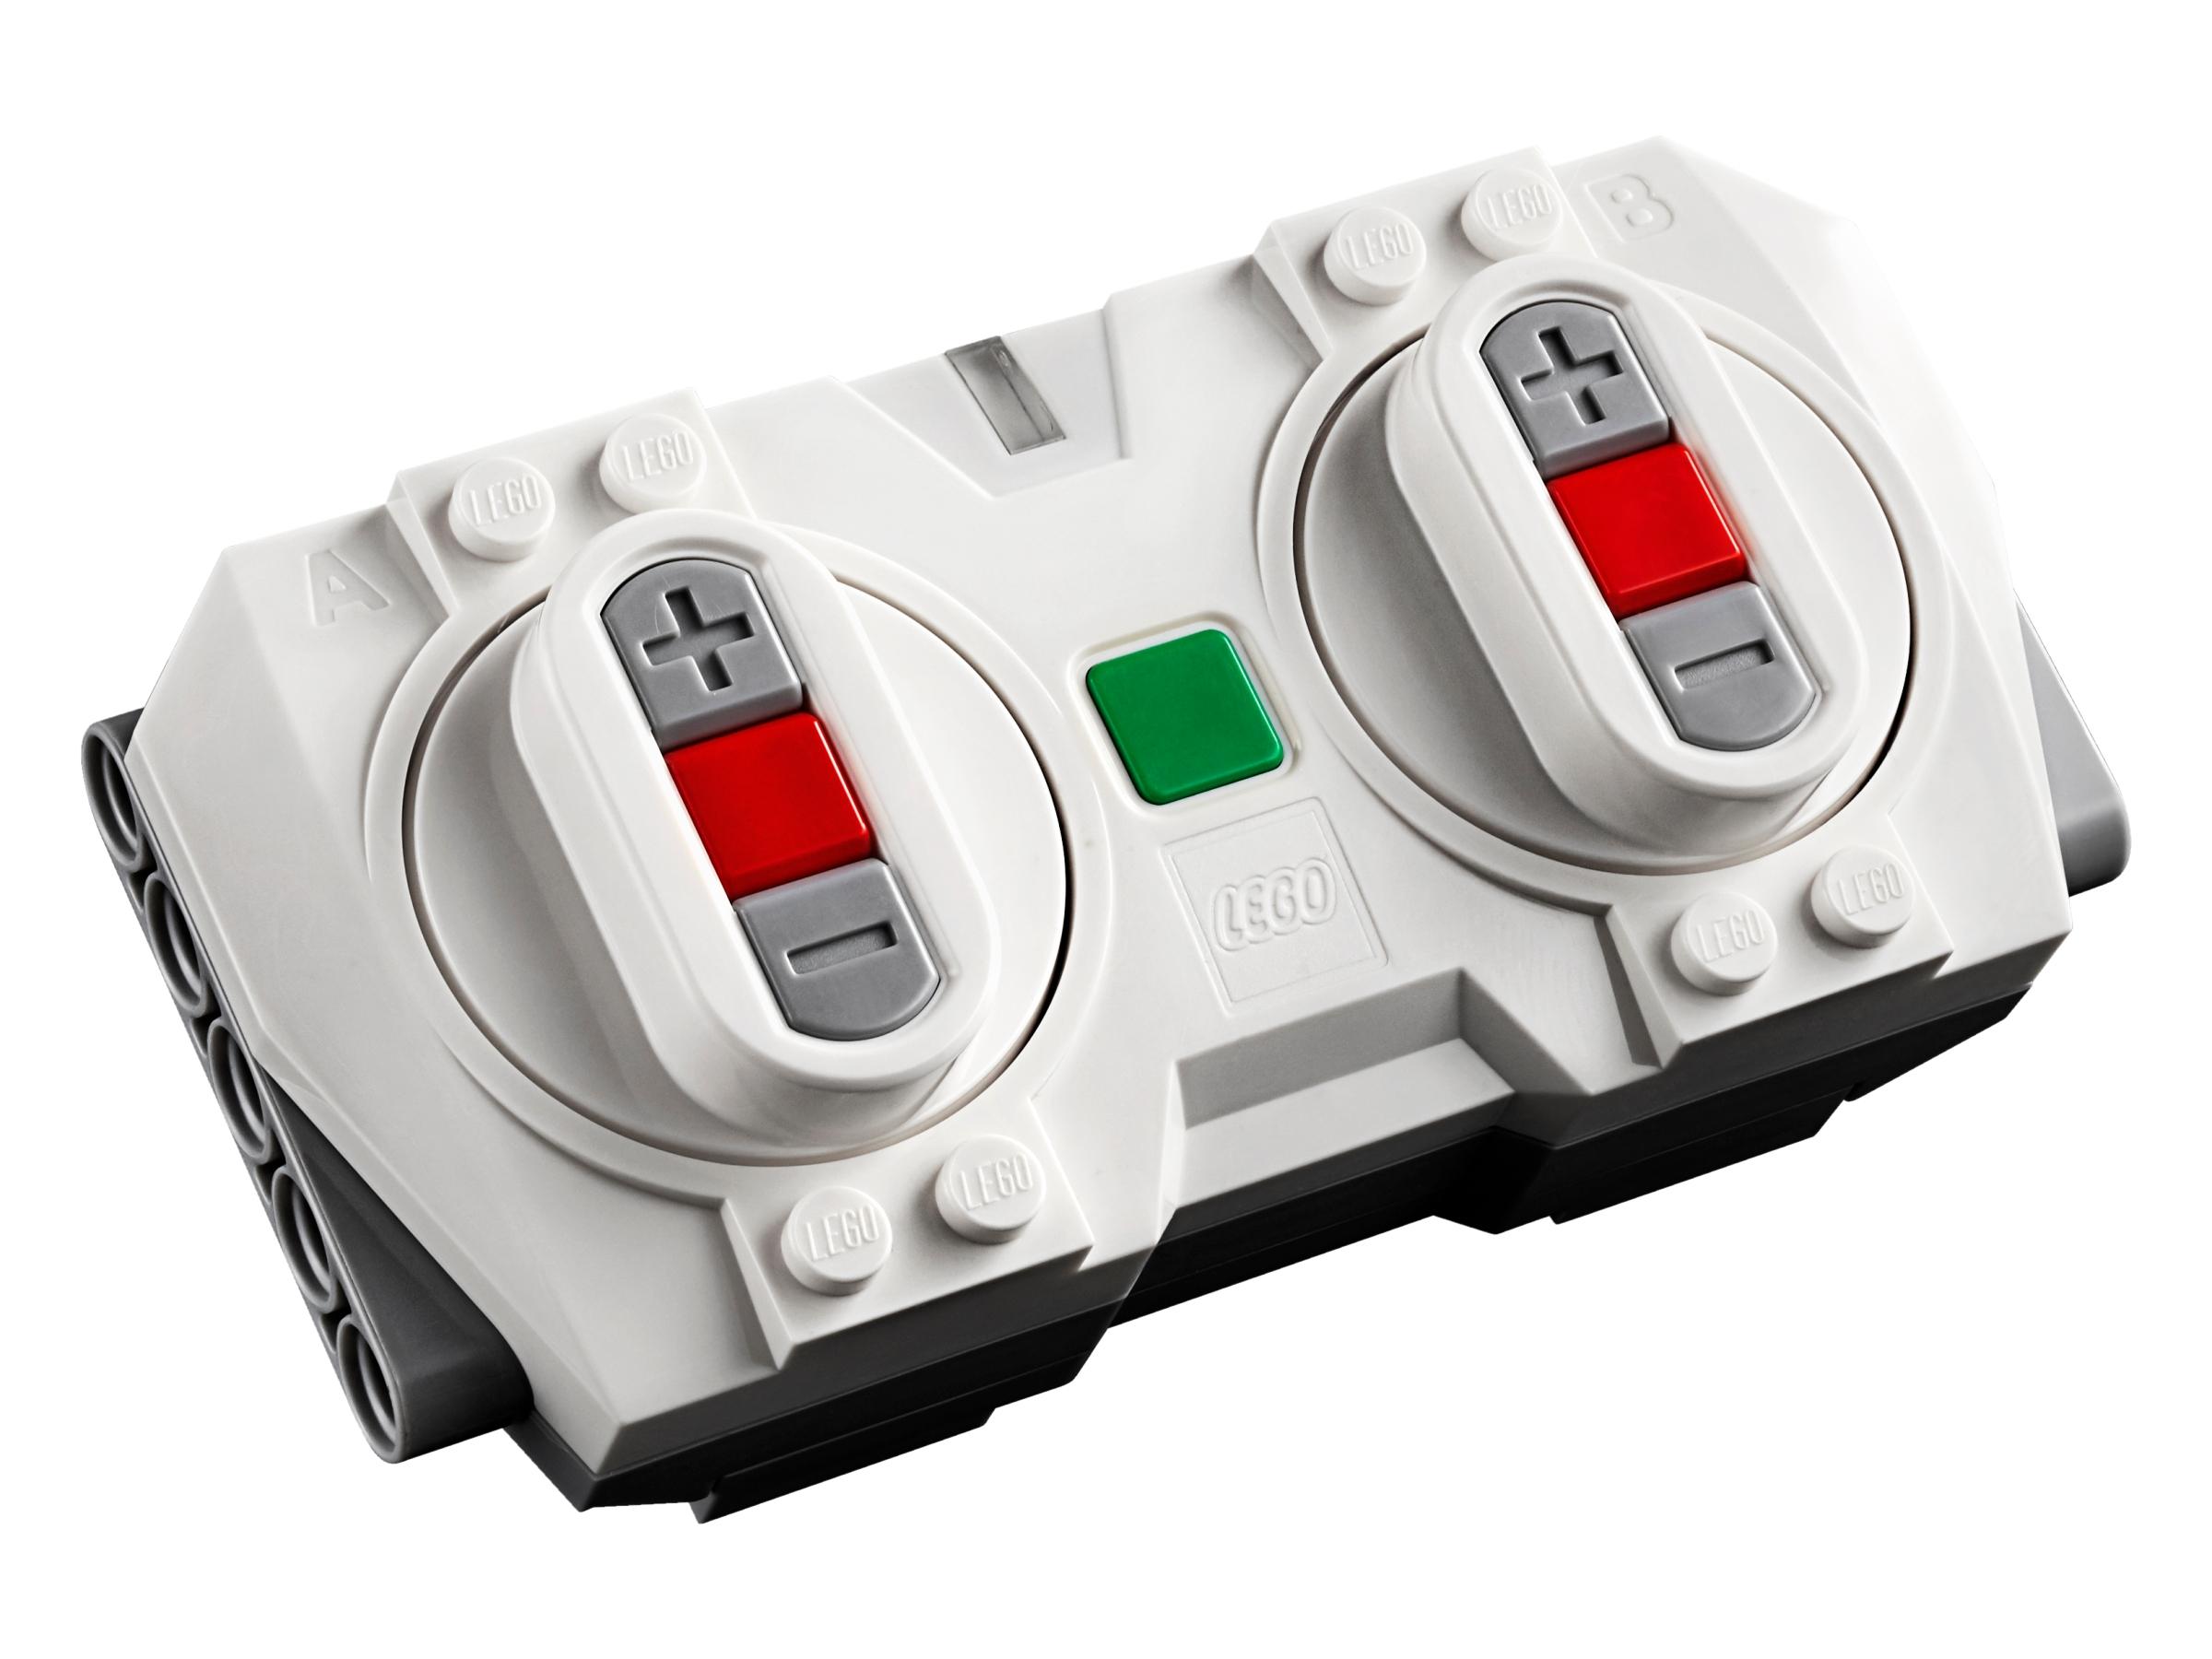 lego 88010 fjernkontroll